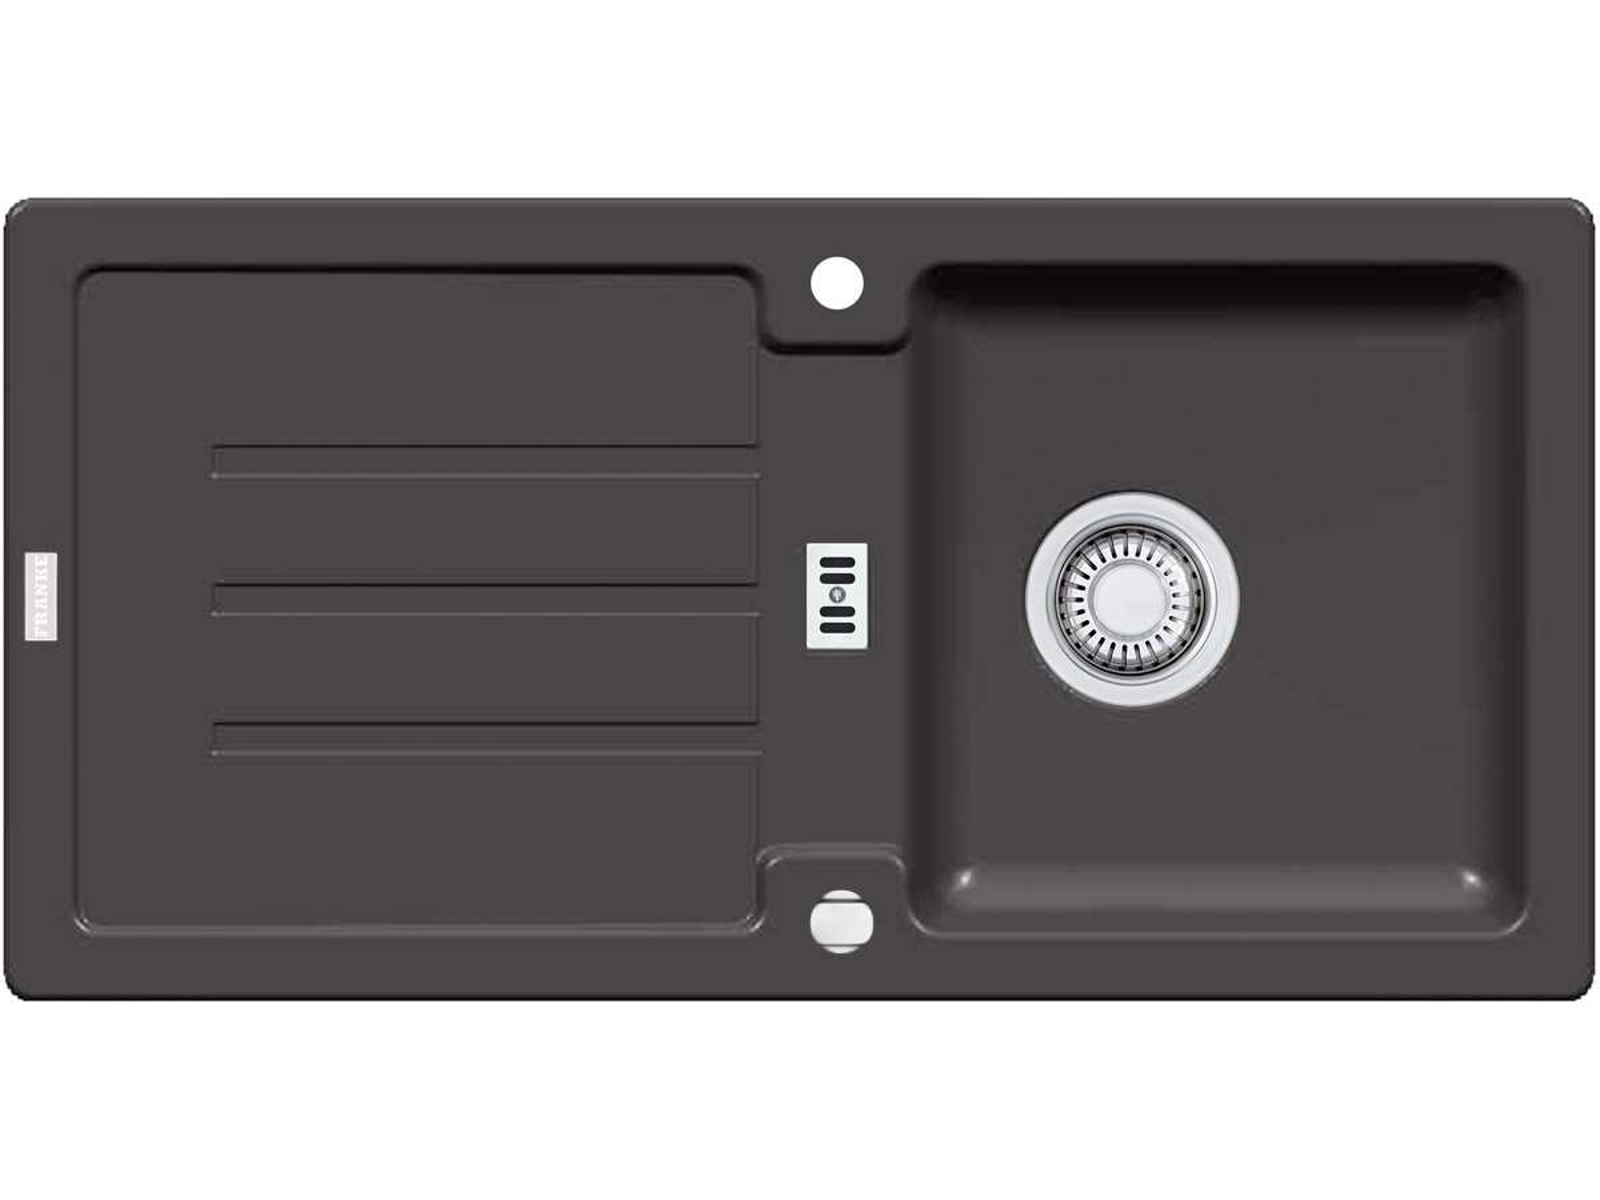 Franke Strata STG 614 Graphit Granitspüle Exzenterventil